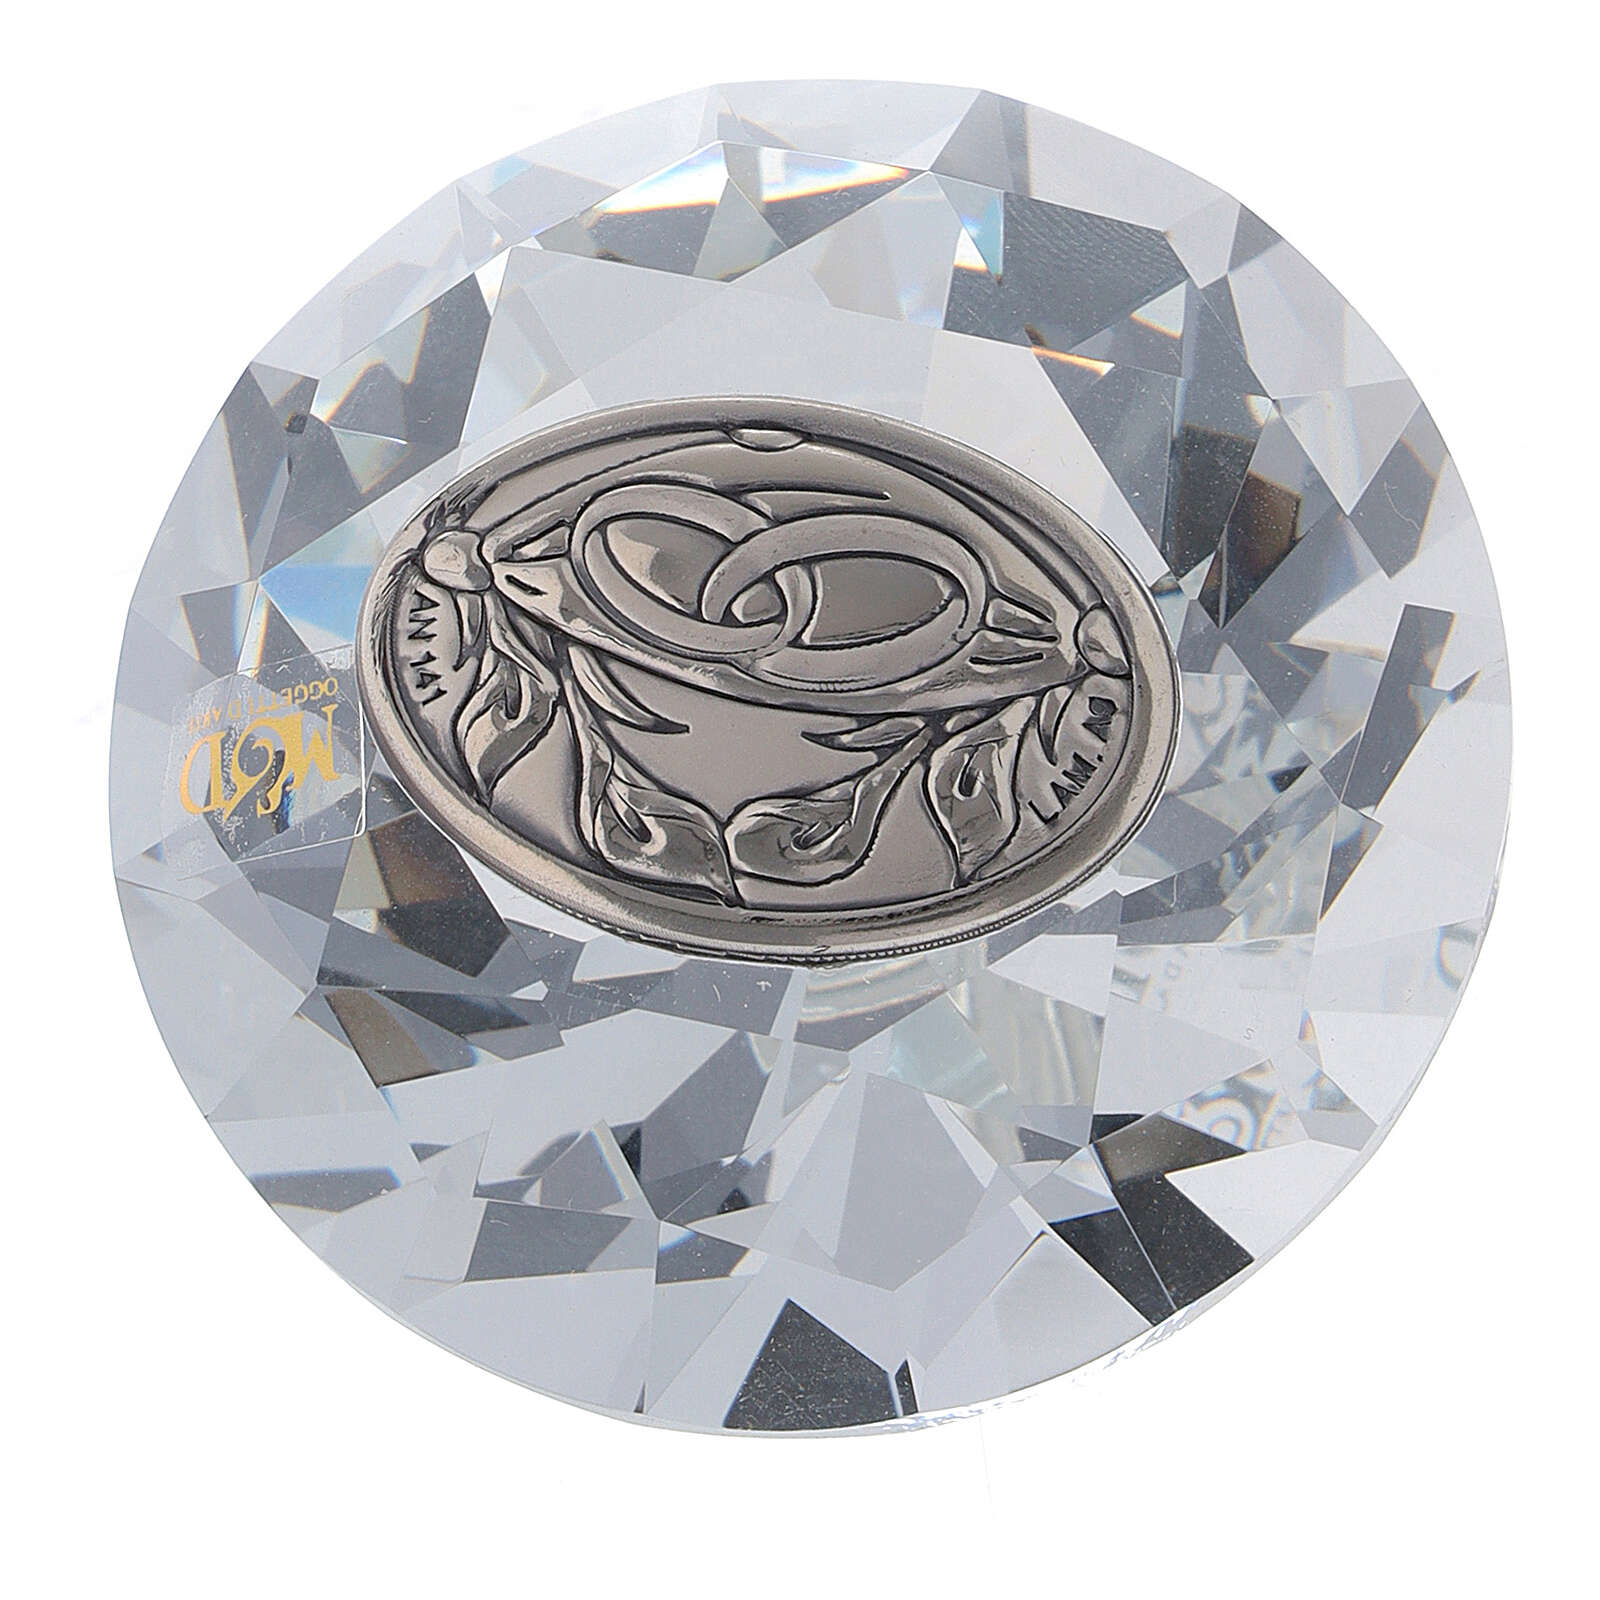 Diamond shaped favor for wedding 3